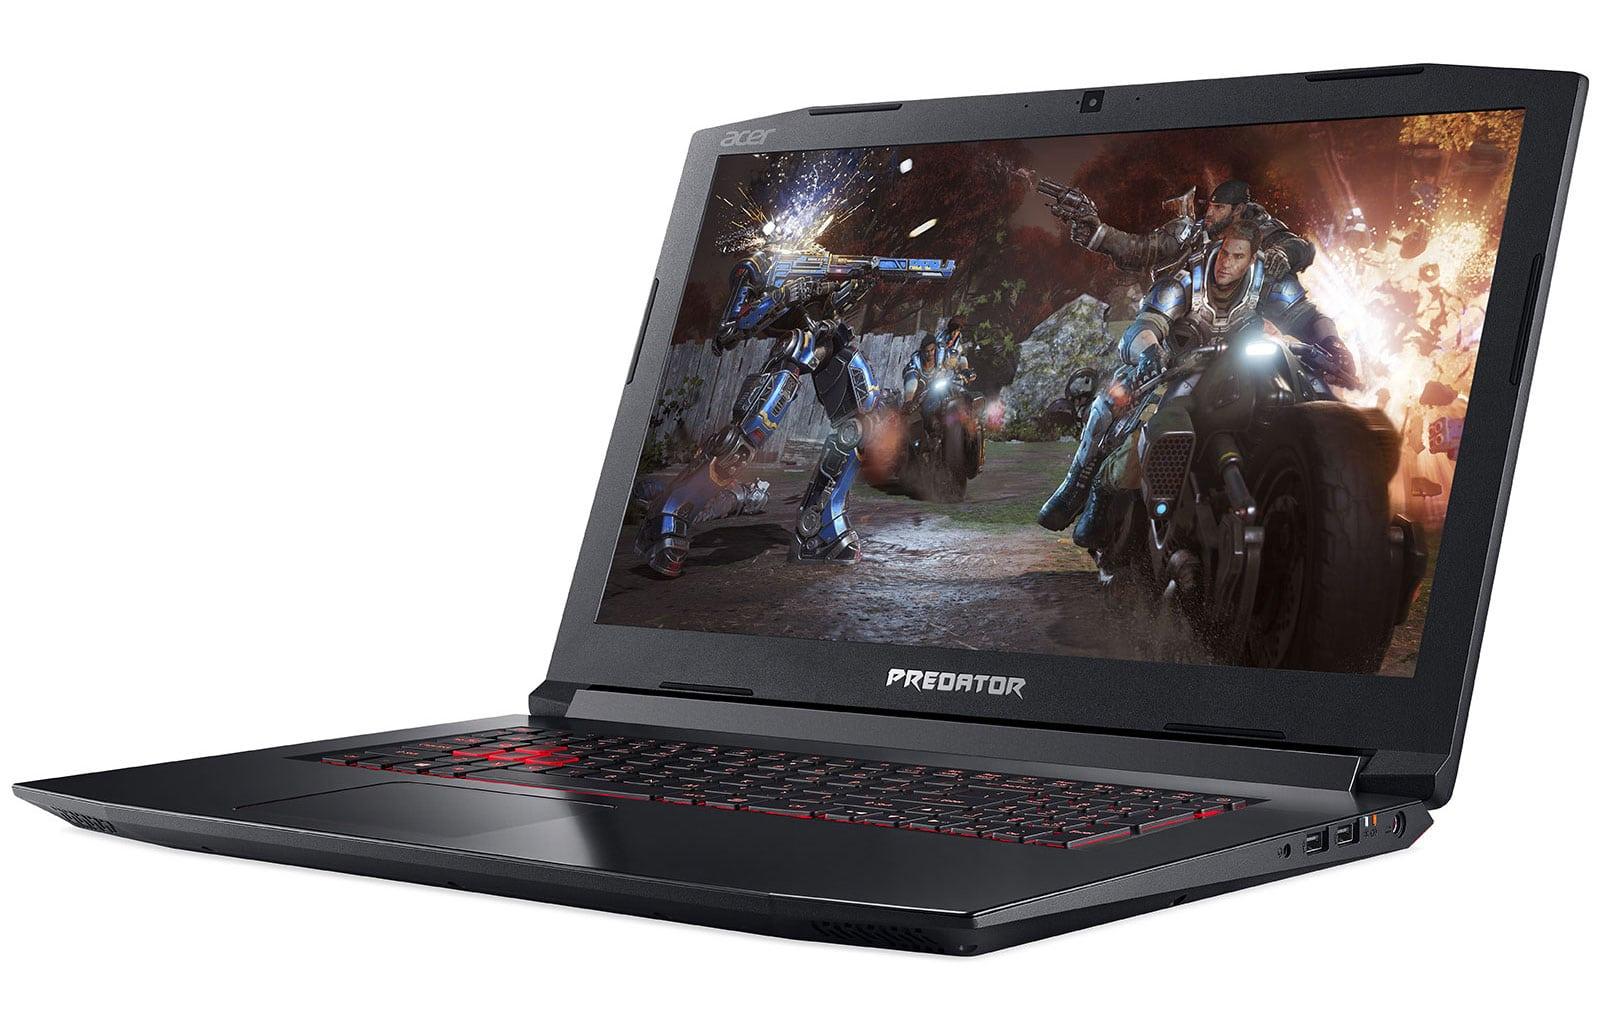 "Acer Predator PH317-52-77LX, PC gamer 17"" puissant (999€)"